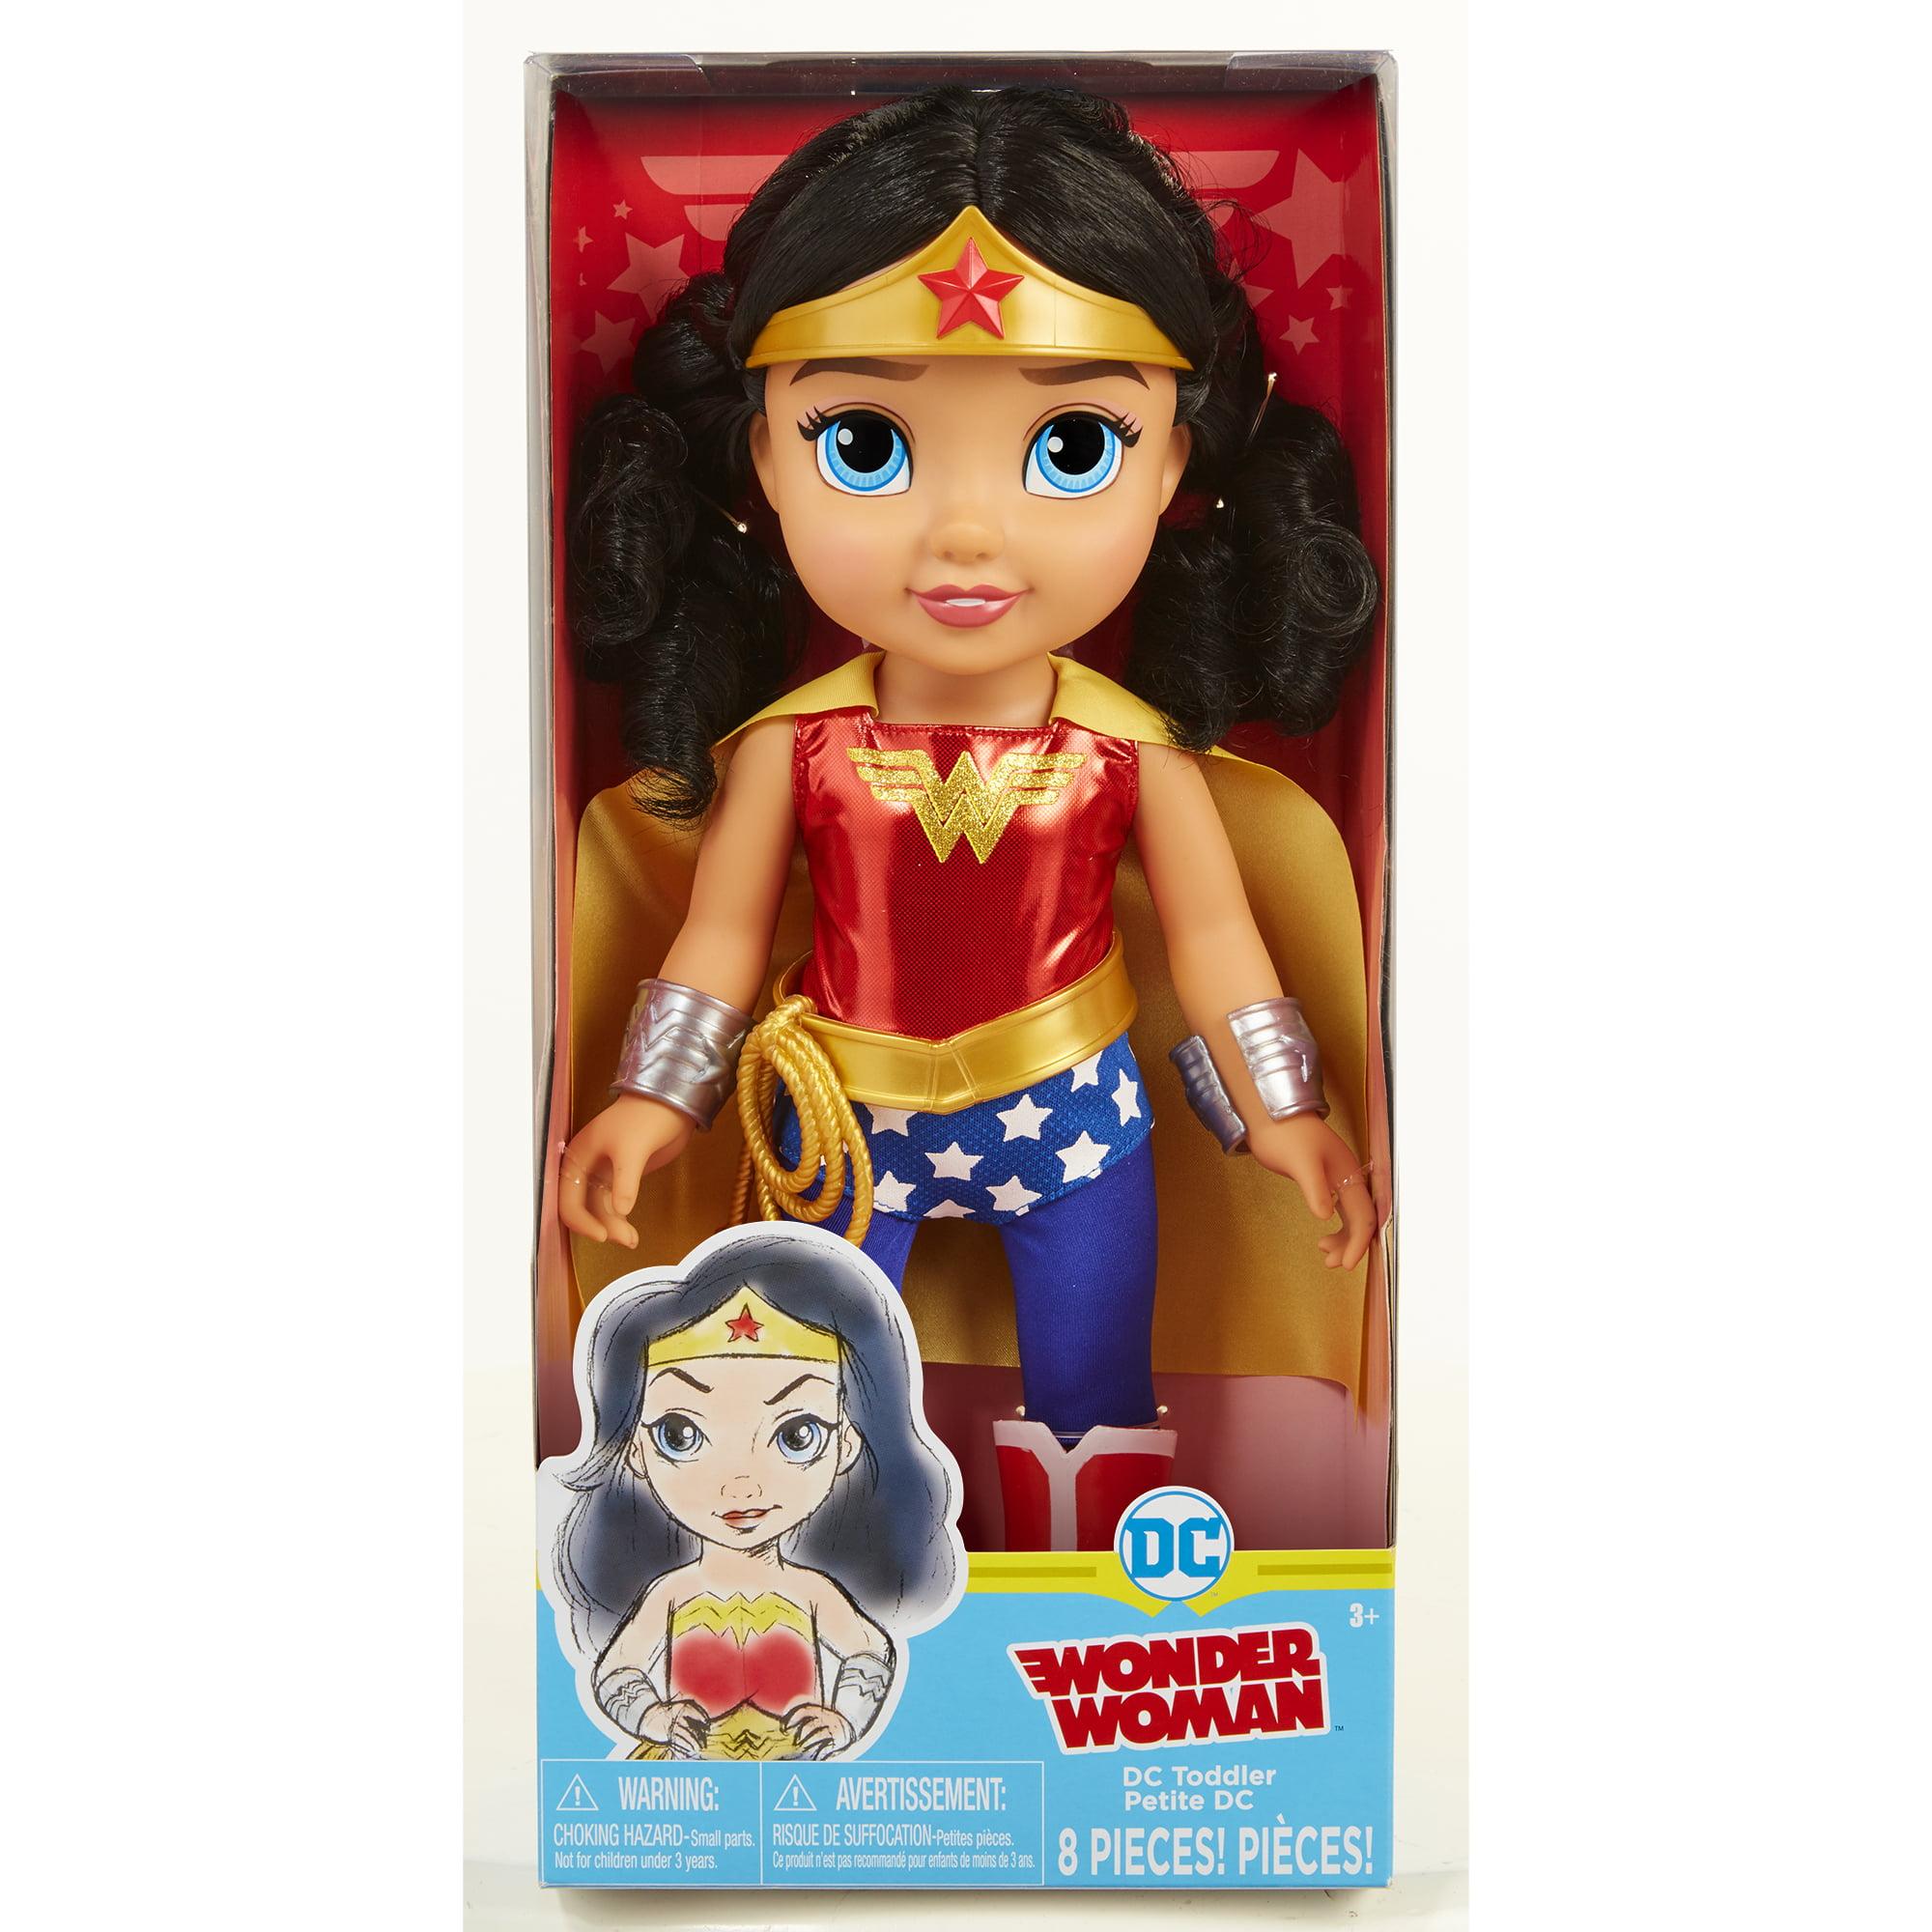 DC Wonder Woman Toddler Doll by Jakks Pacific